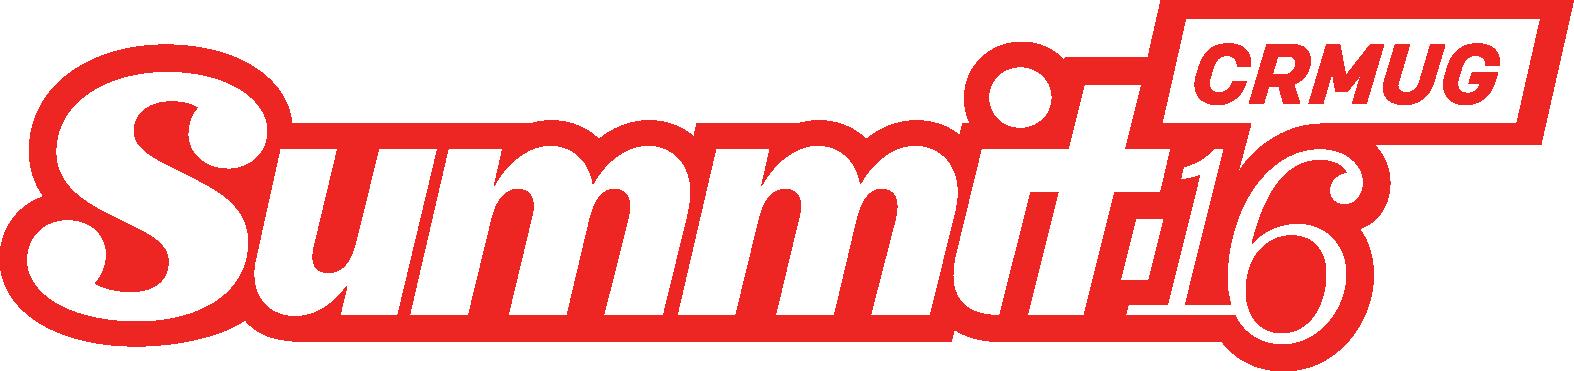 crmug summit 16